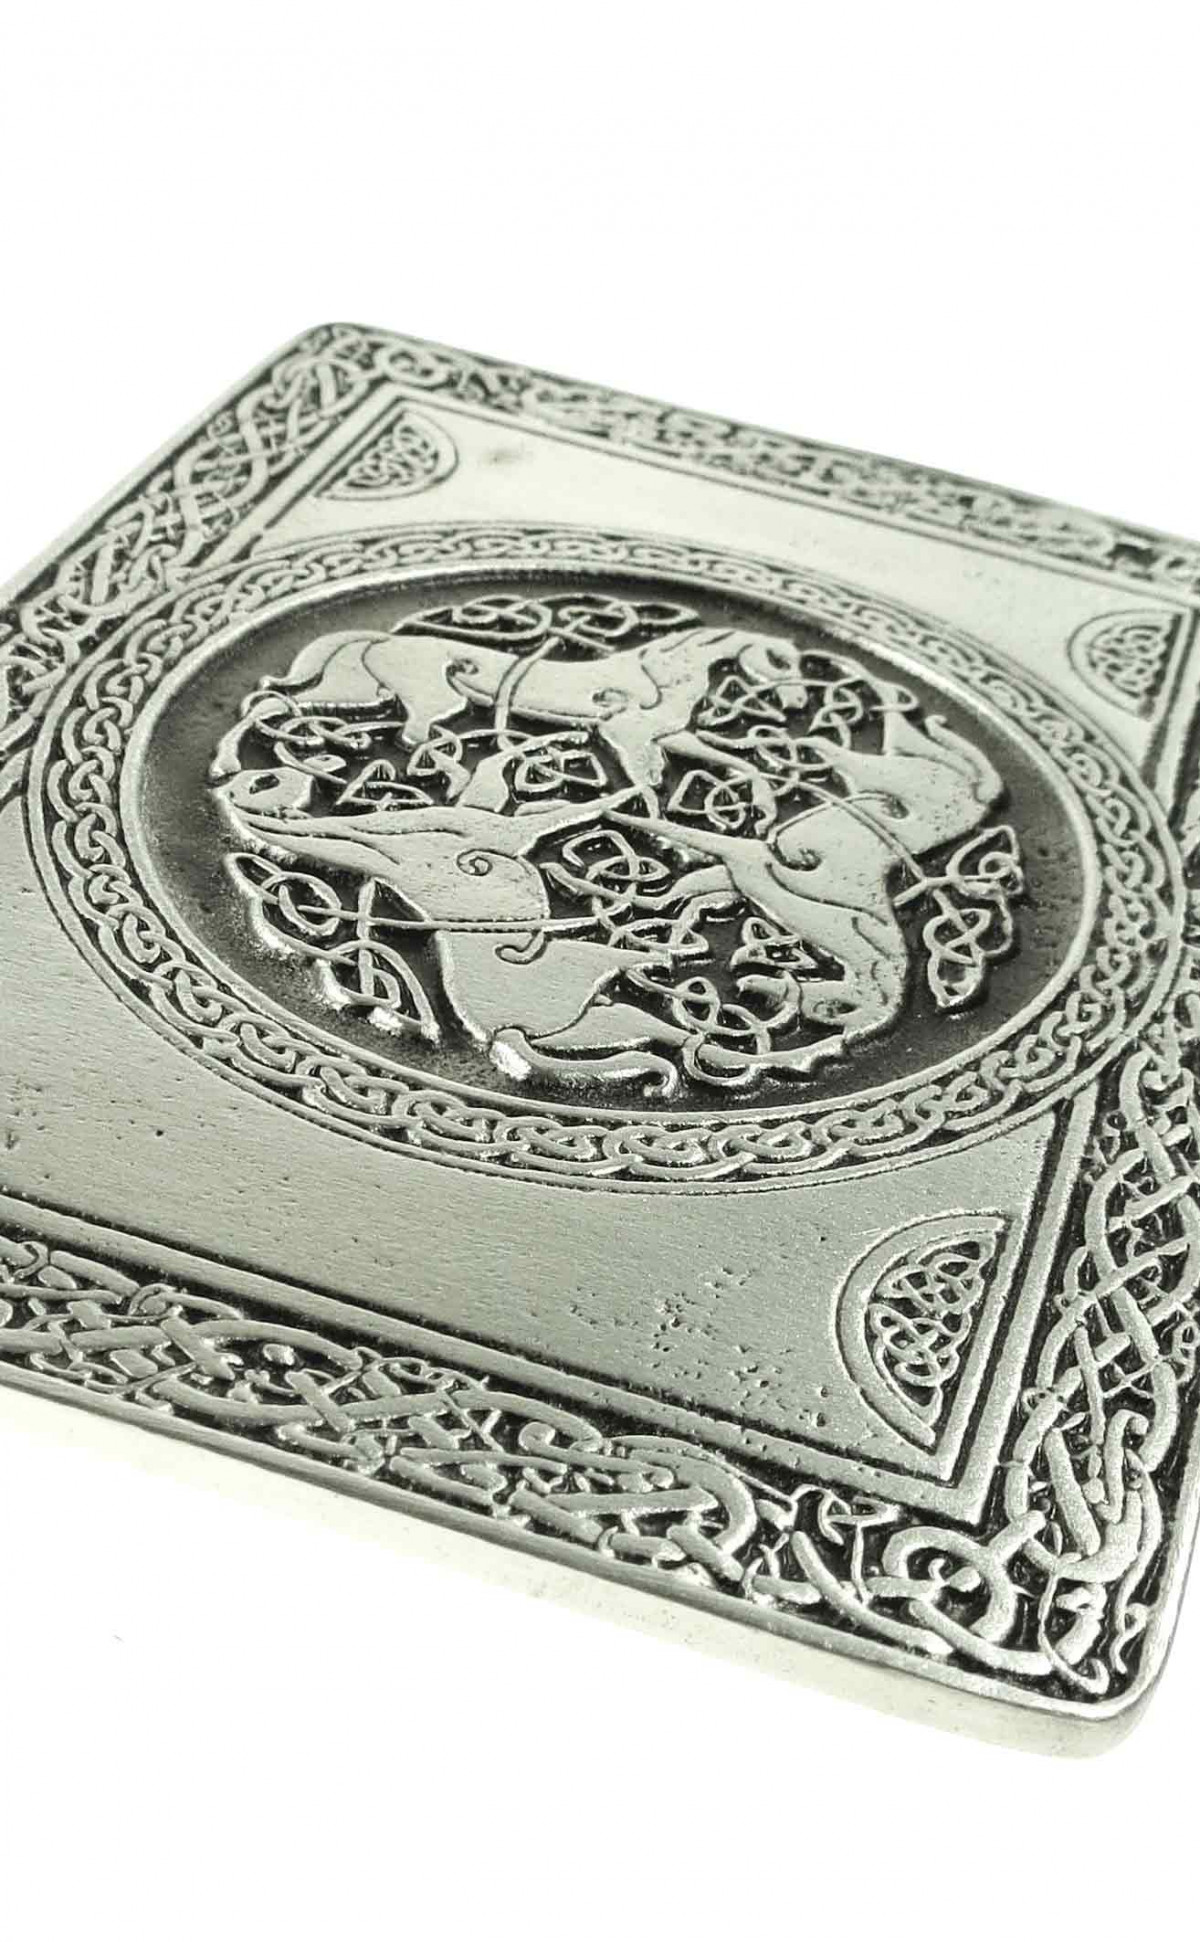 gaeli-sr_gaeli_antique_silver_wallace_buckle_2